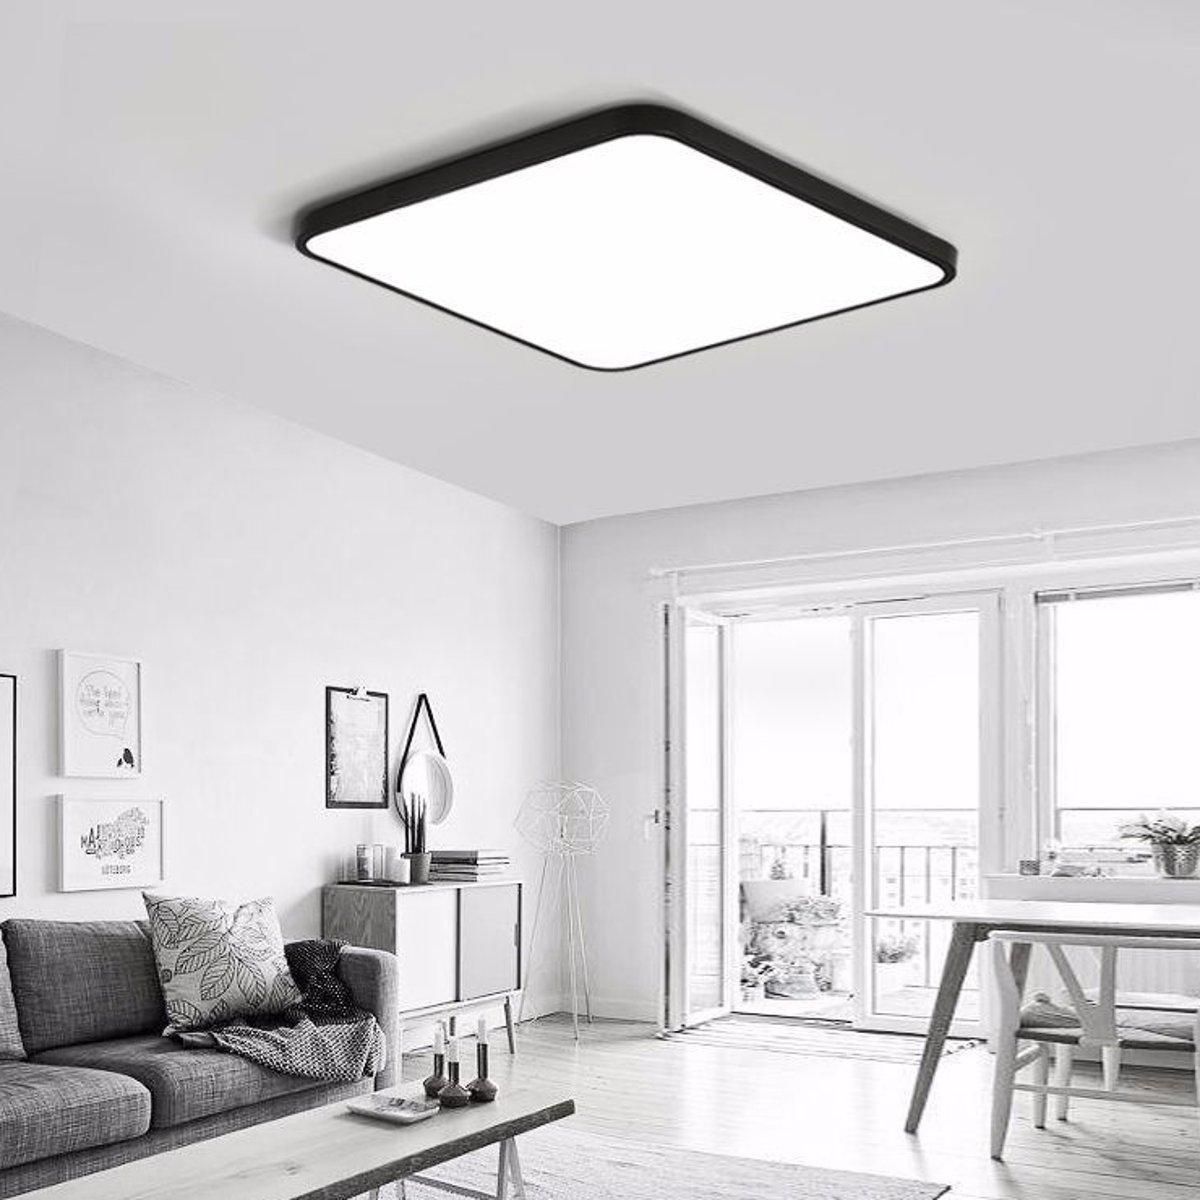 Home, Furniture & DIY Bright LED Ceiling Light Panel Home Kitchen